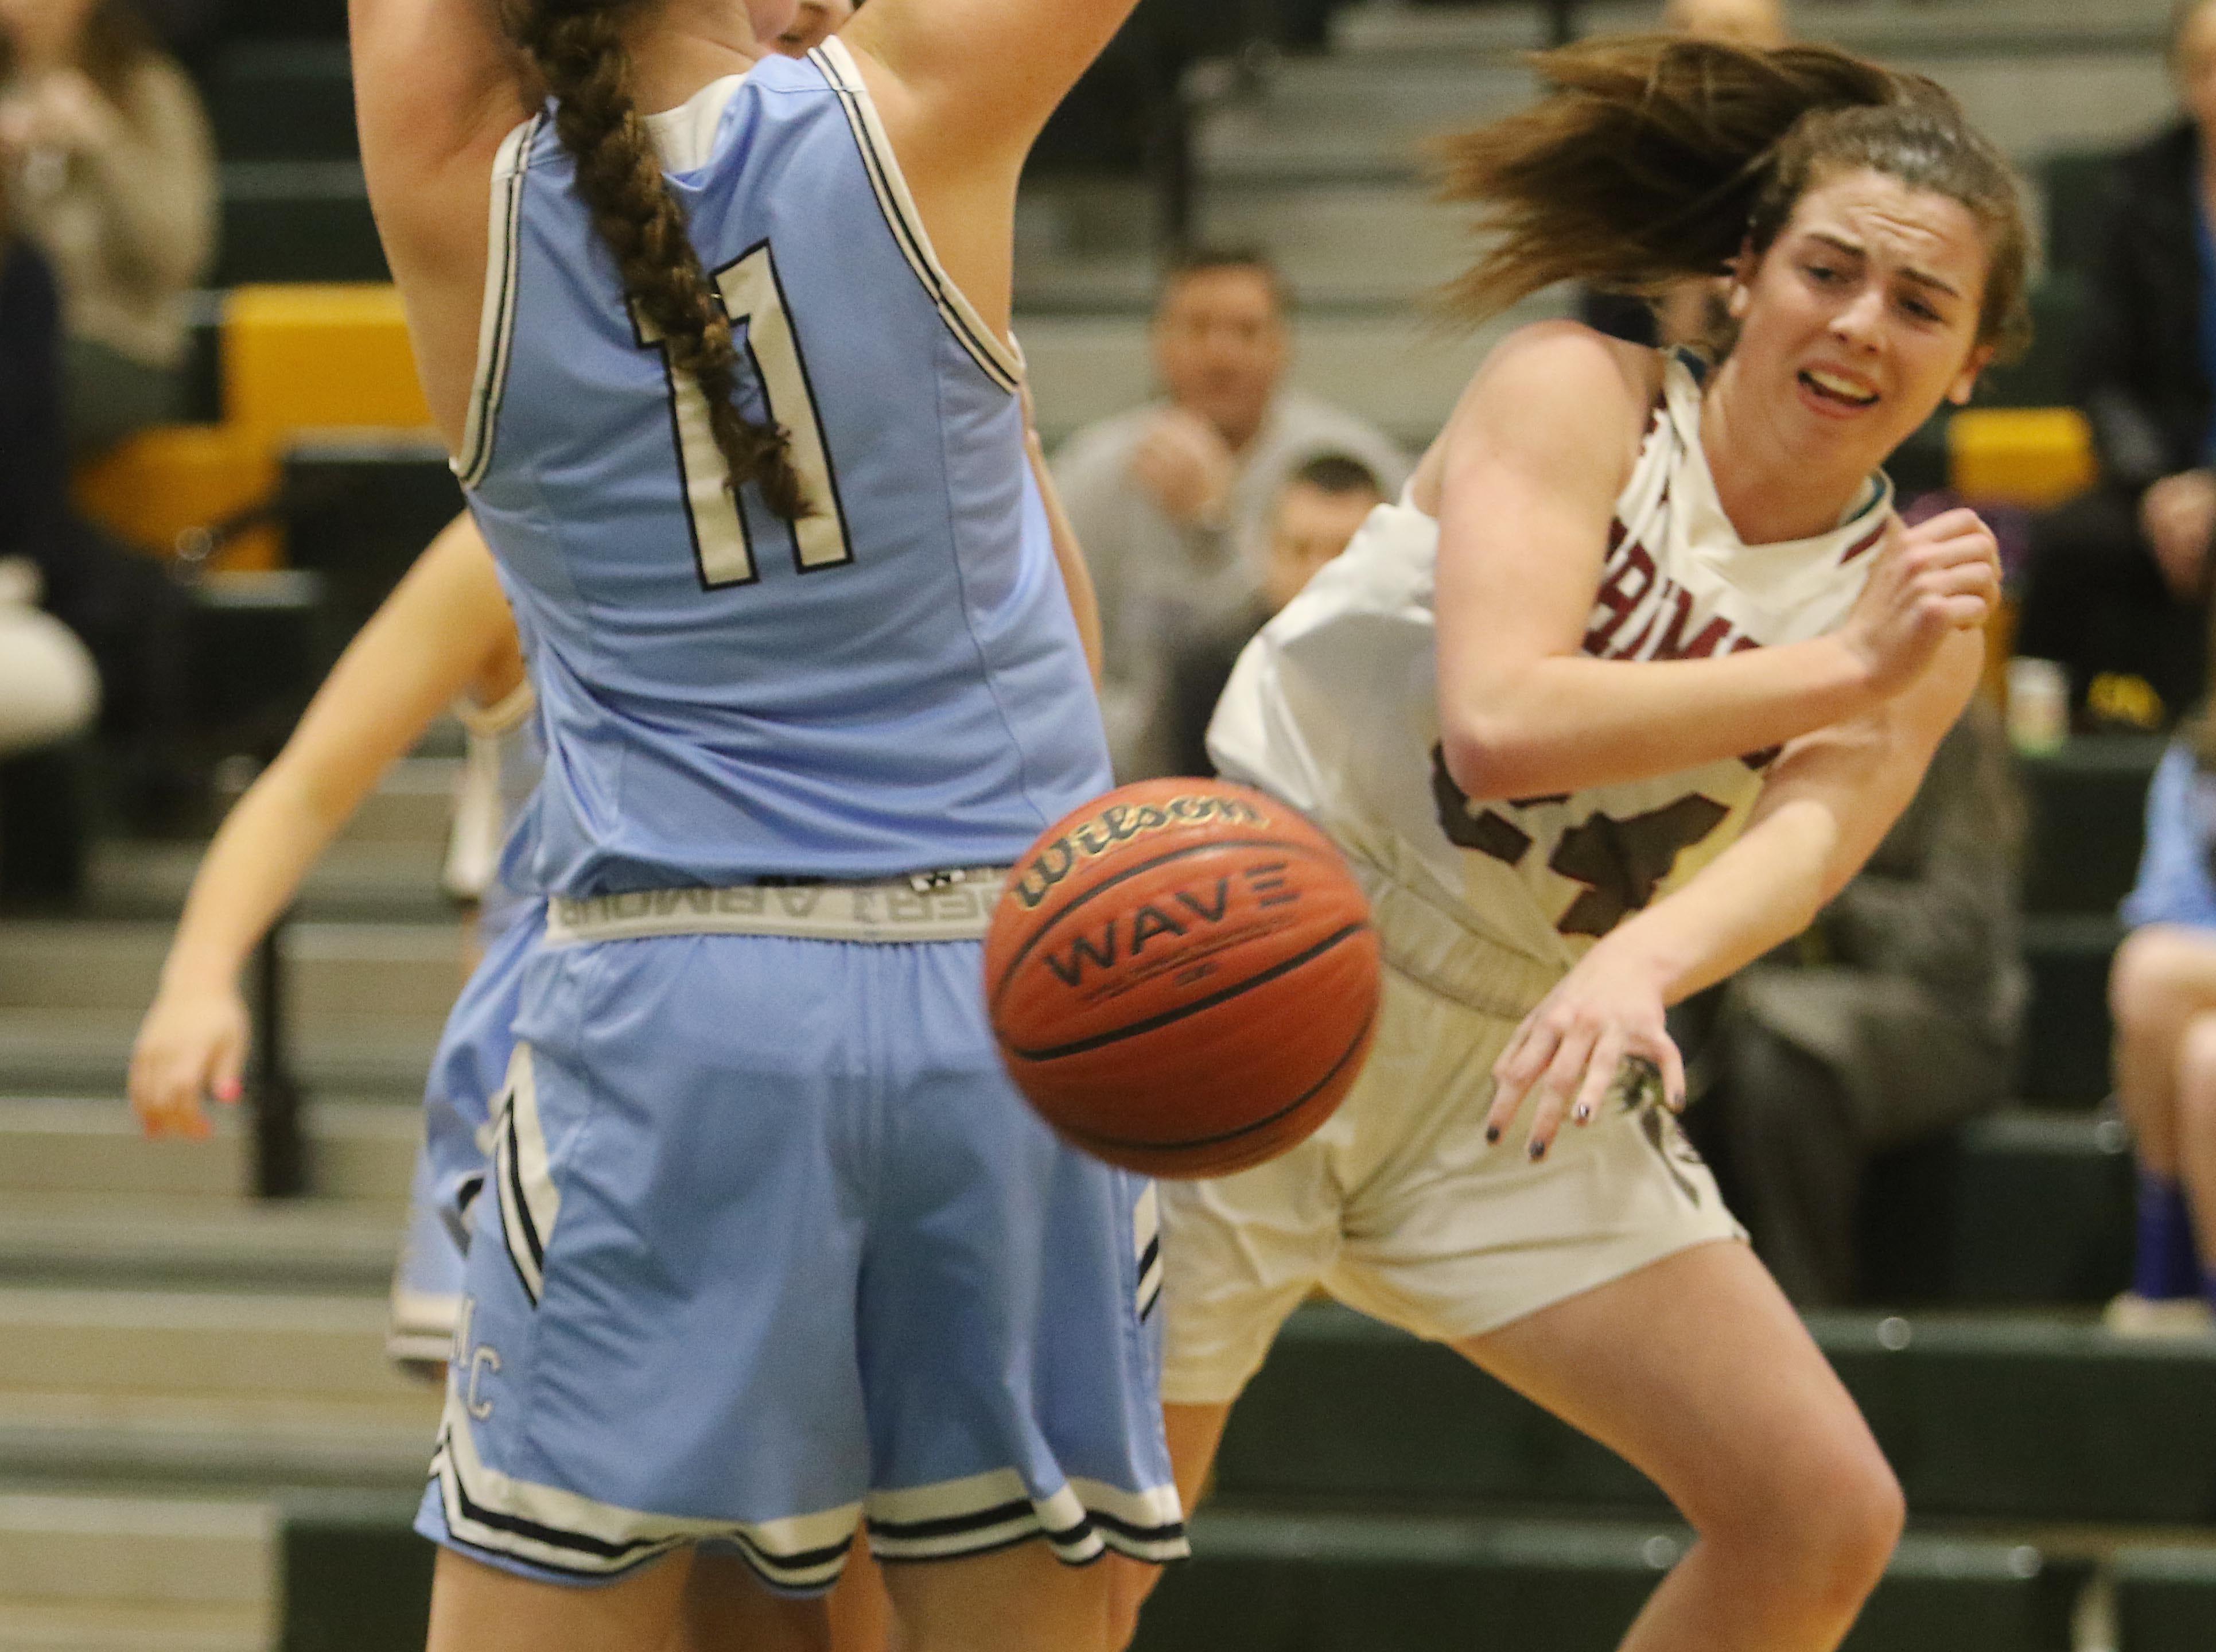 Bridget Monaghan of Morristown-Beard passes the ball away from Caroline Coleman of West Morris.